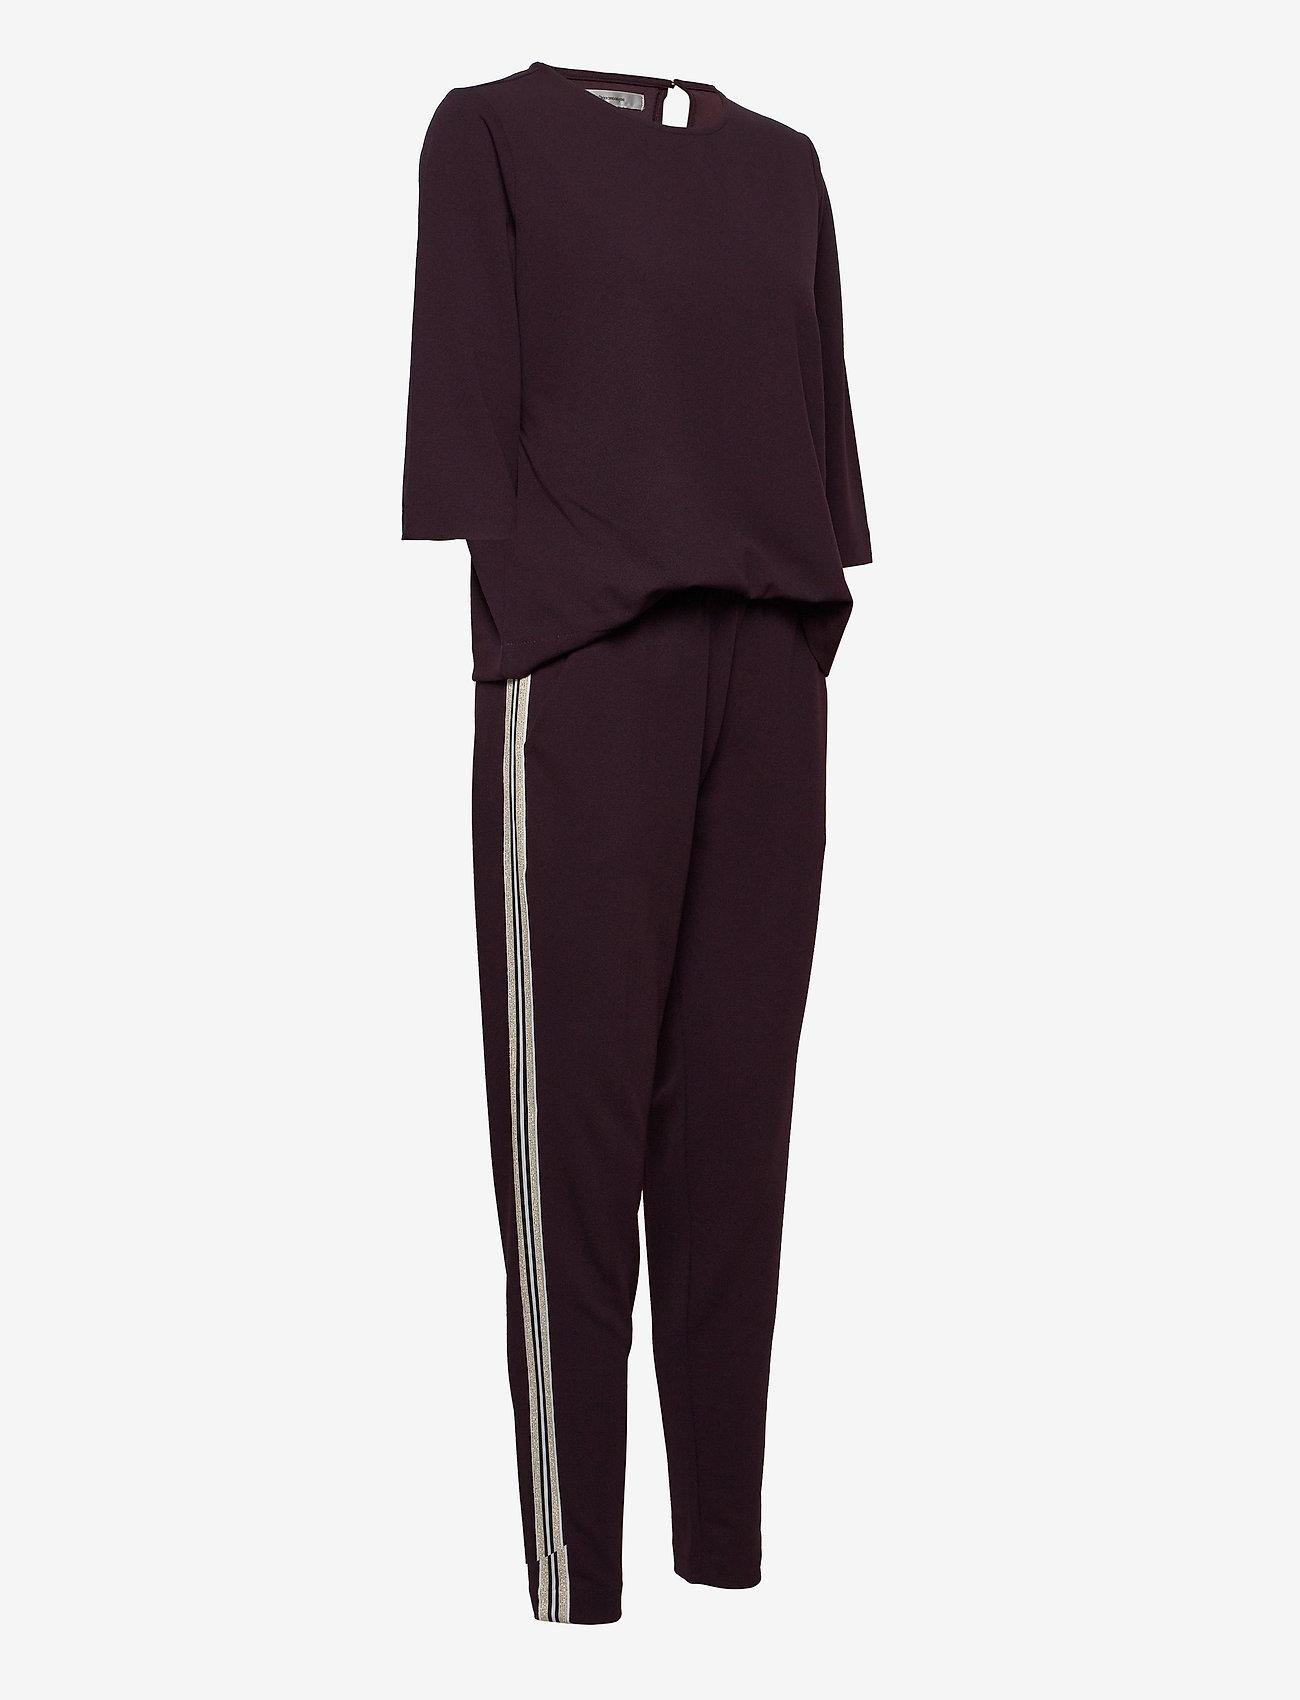 Soyaconcept - SC-MASCHA - clothing - maroon - 2